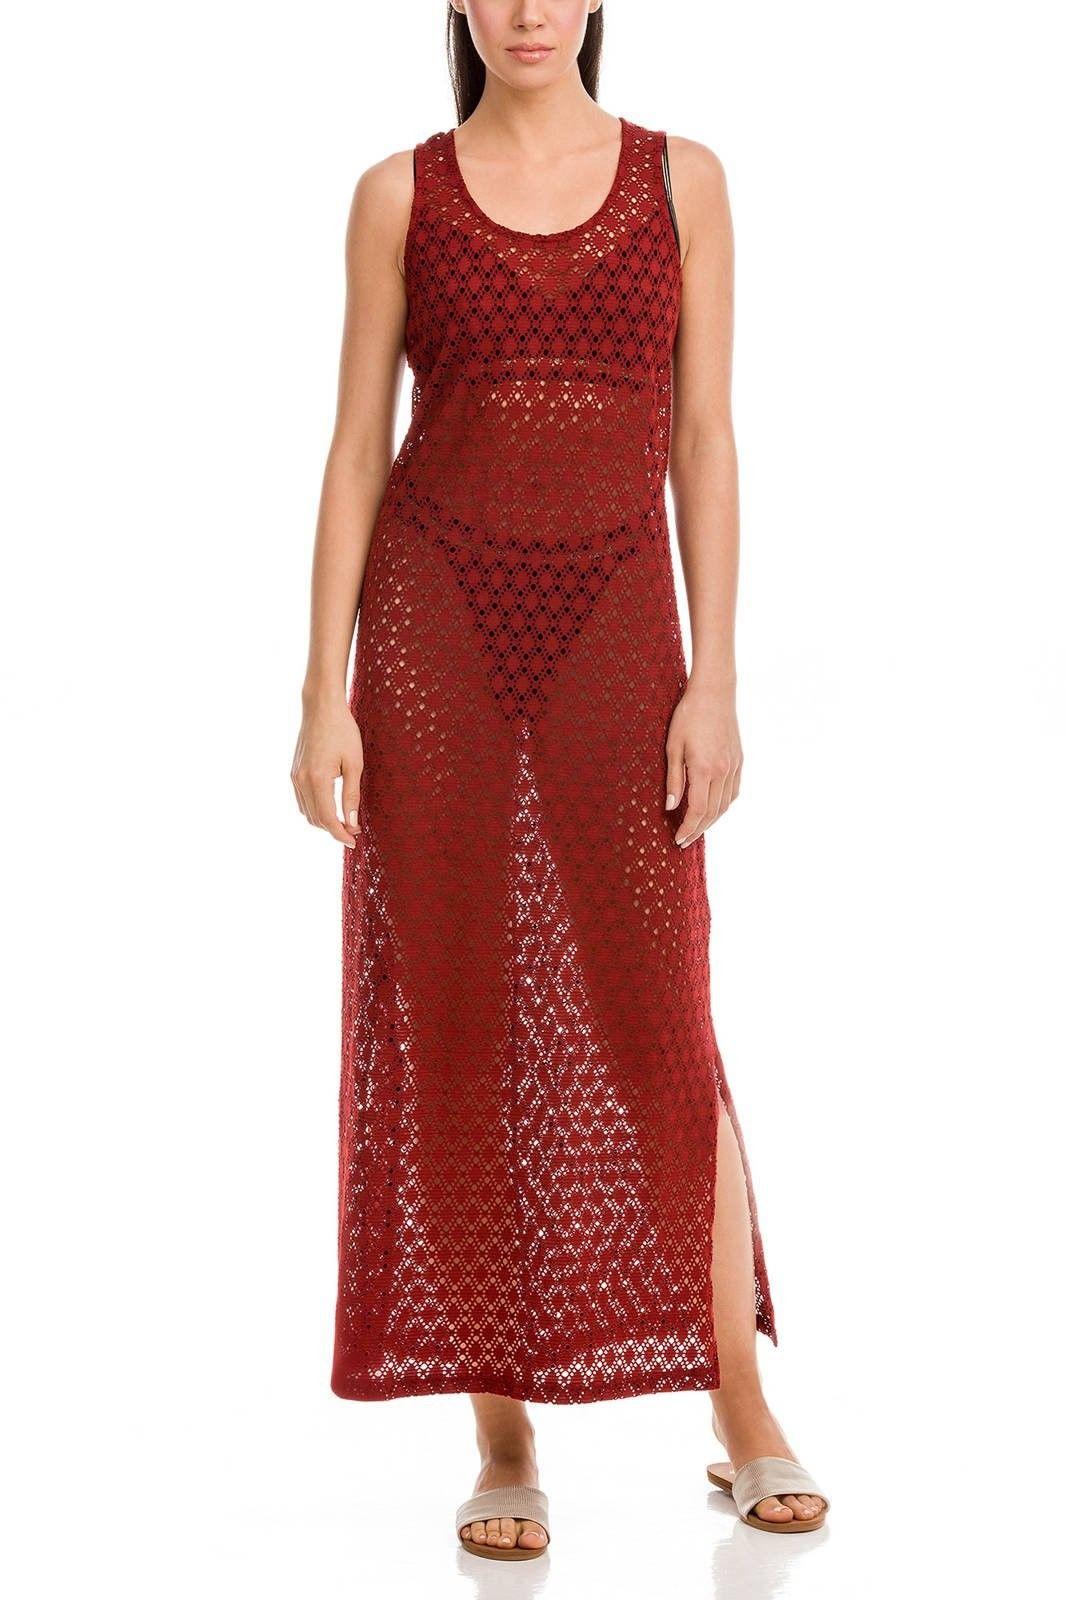 Sukienka plażowa Vamp Narcissa 12574 kolor 489